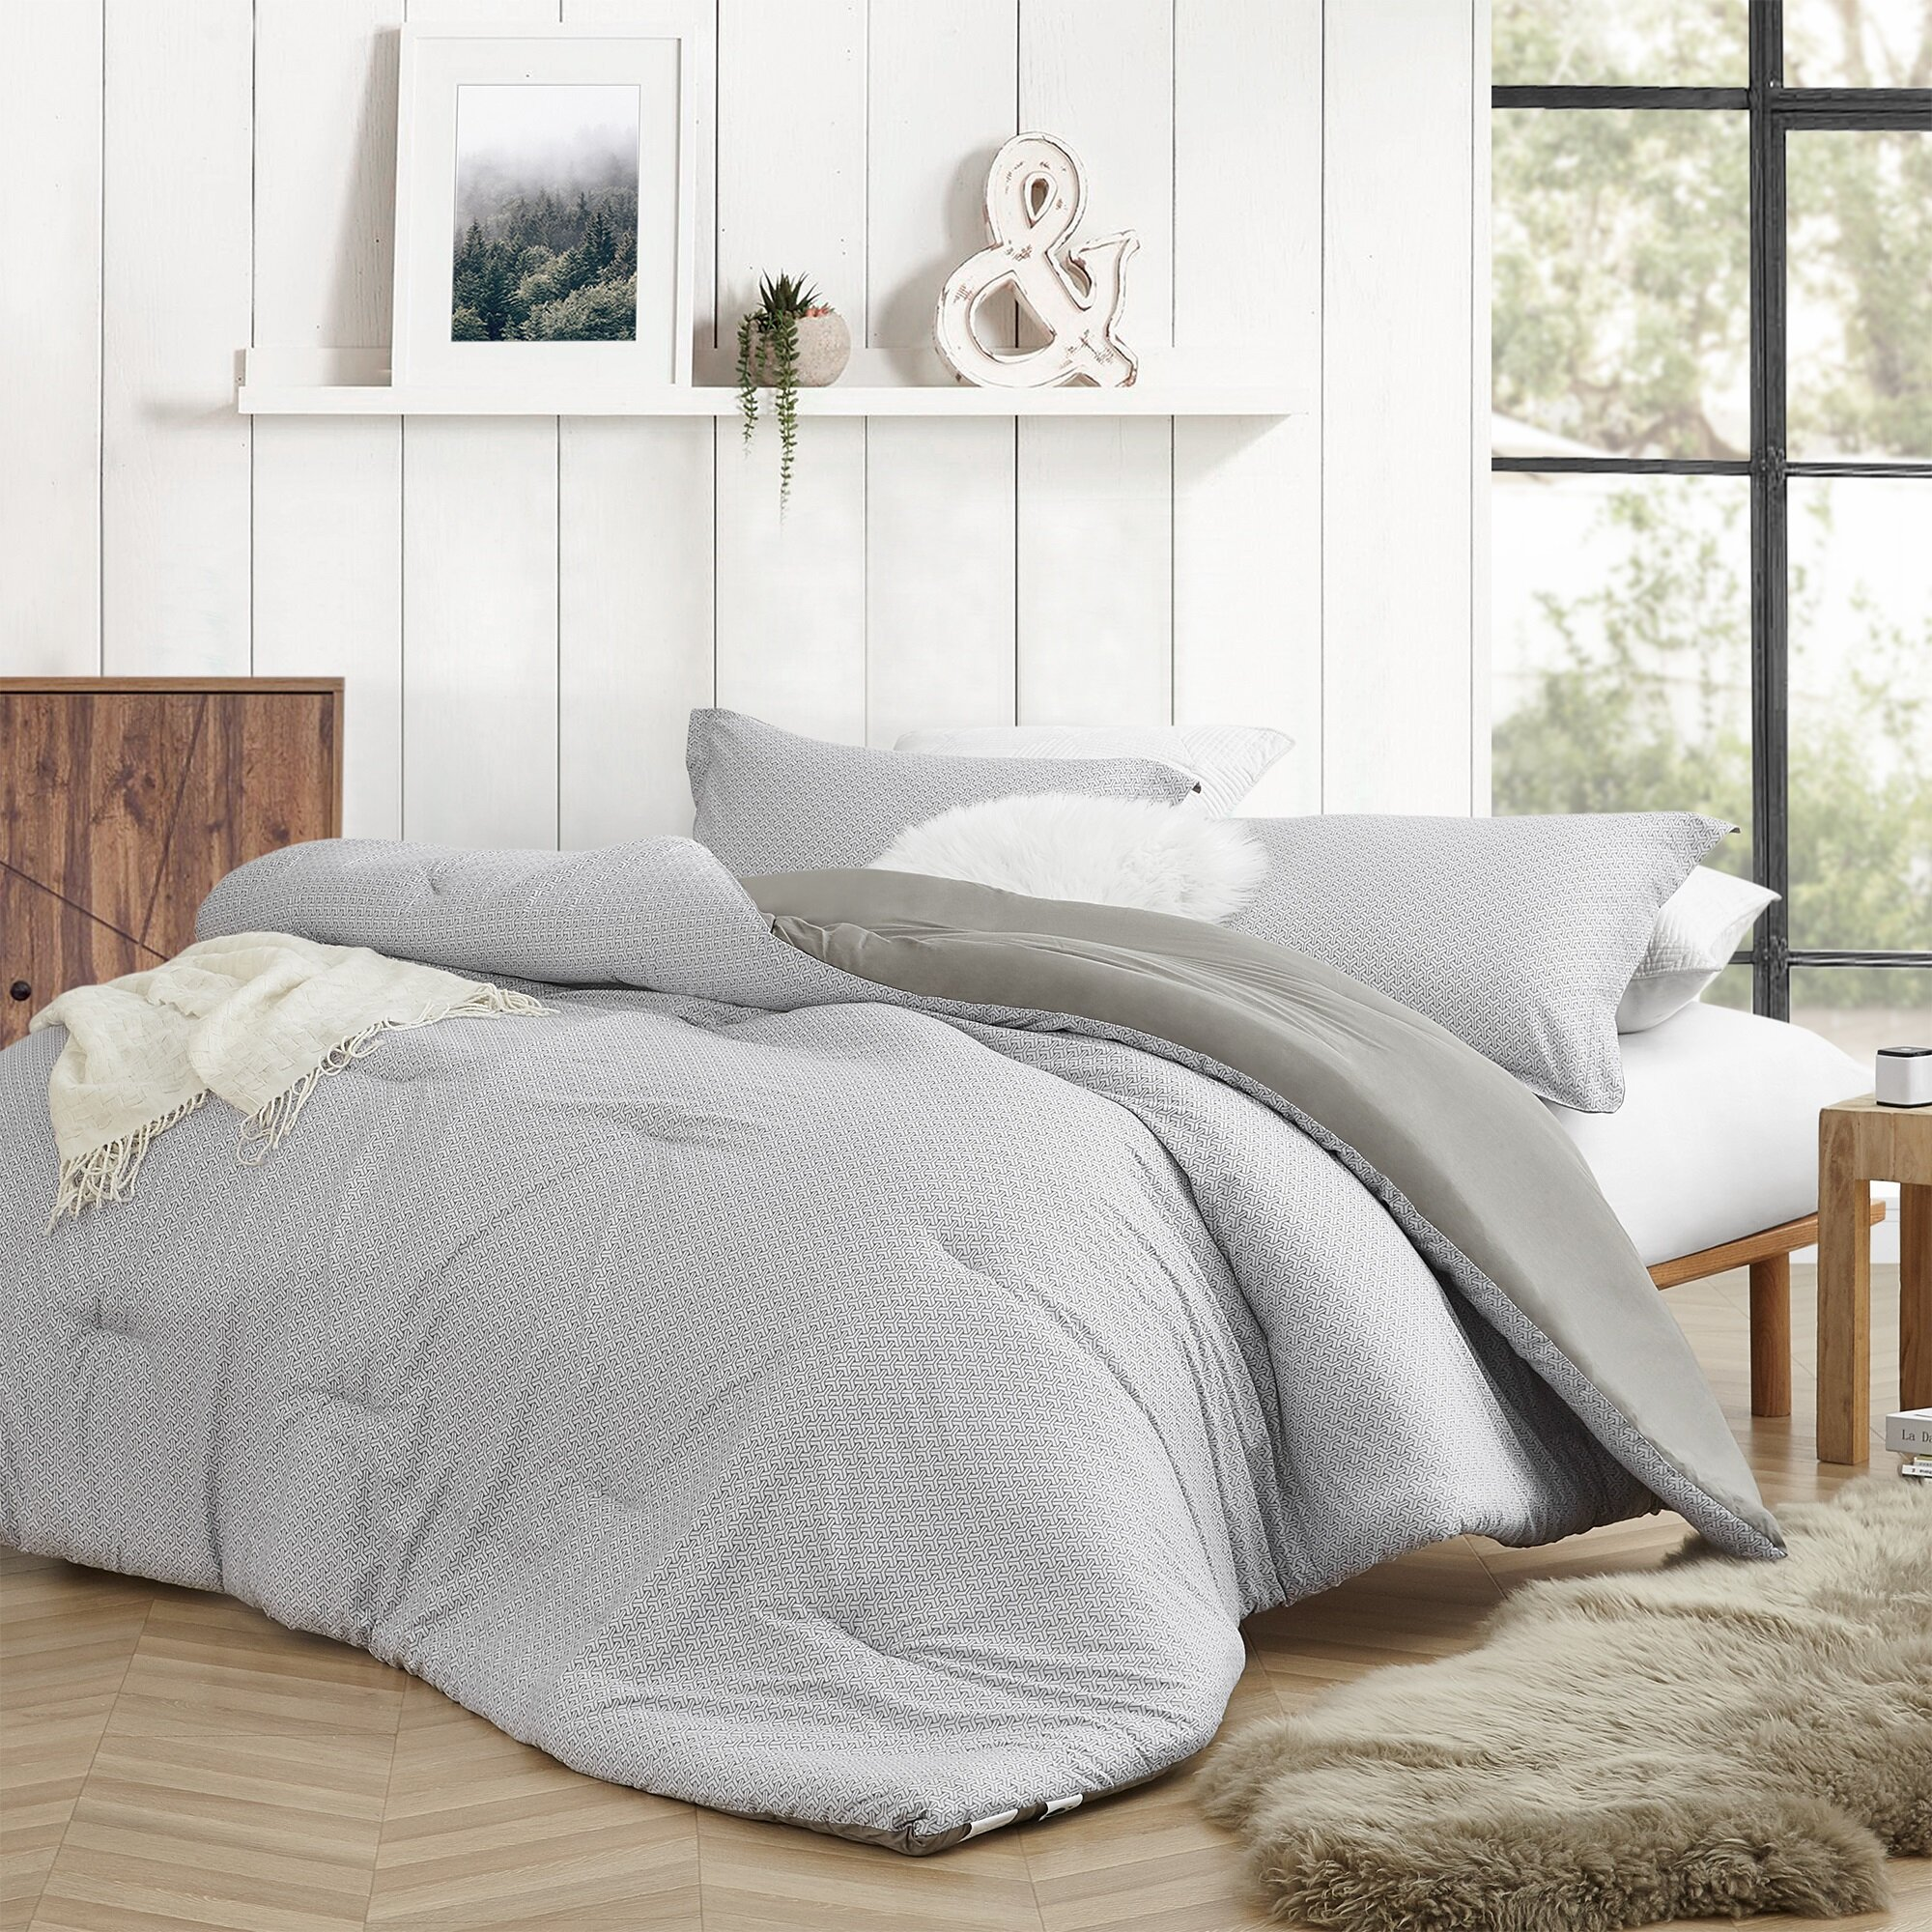 Jacob Duvet Quilt Cover Set With Pillowcases Soft Poly Cotton Luxurious Bed Set